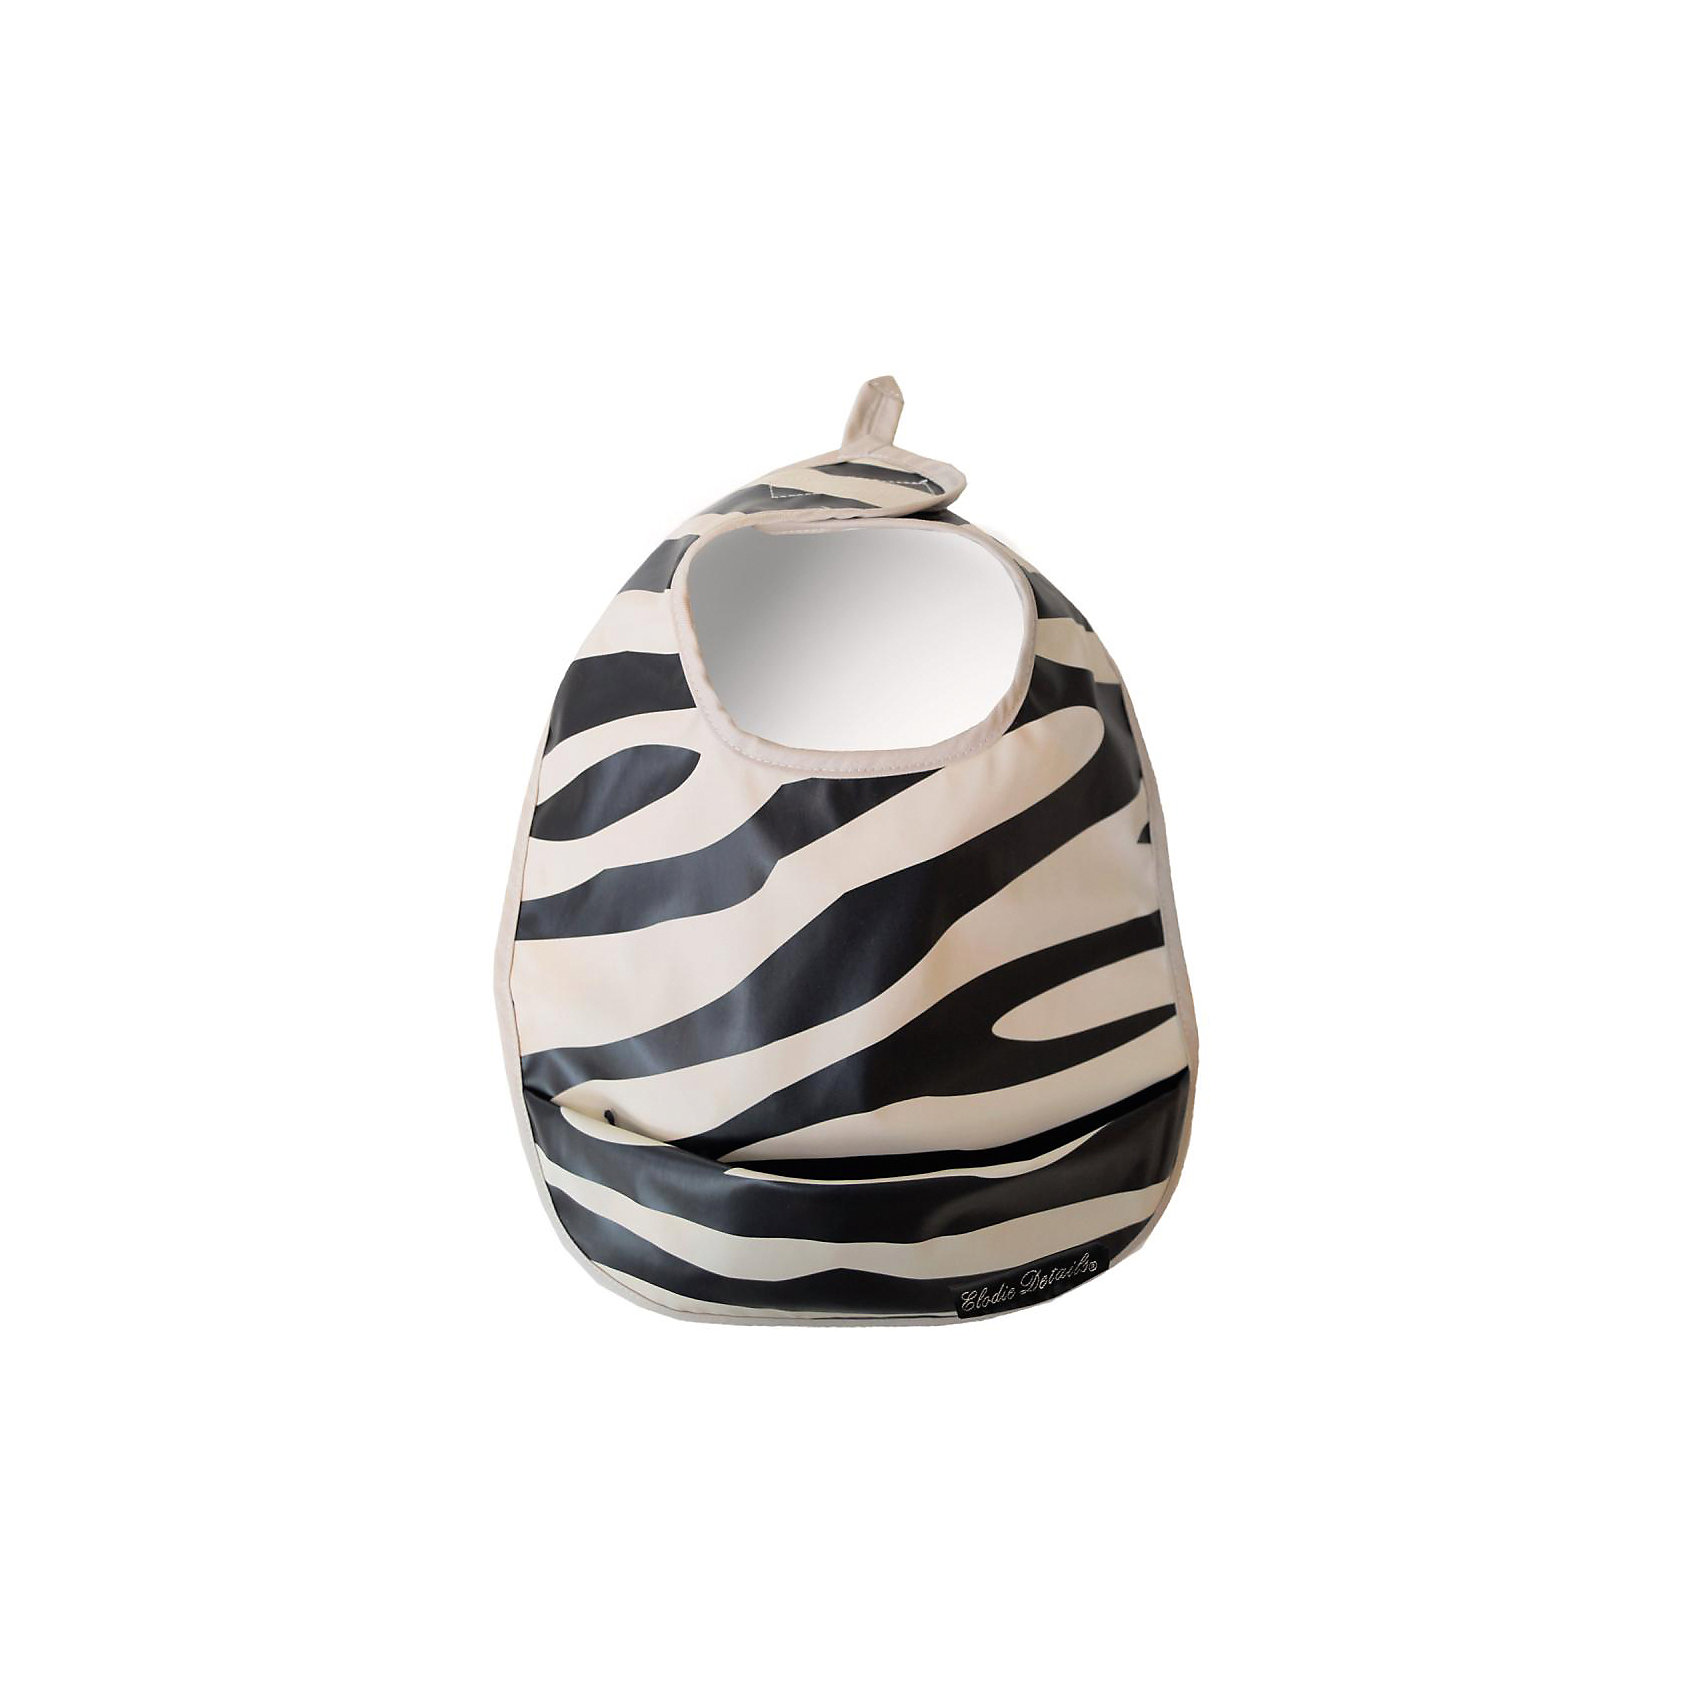 Elodie Details Нагрудник полиуретан Zebra Sunshine, Elodie Details москитная сетка для коляски elodie details zebra sunshine